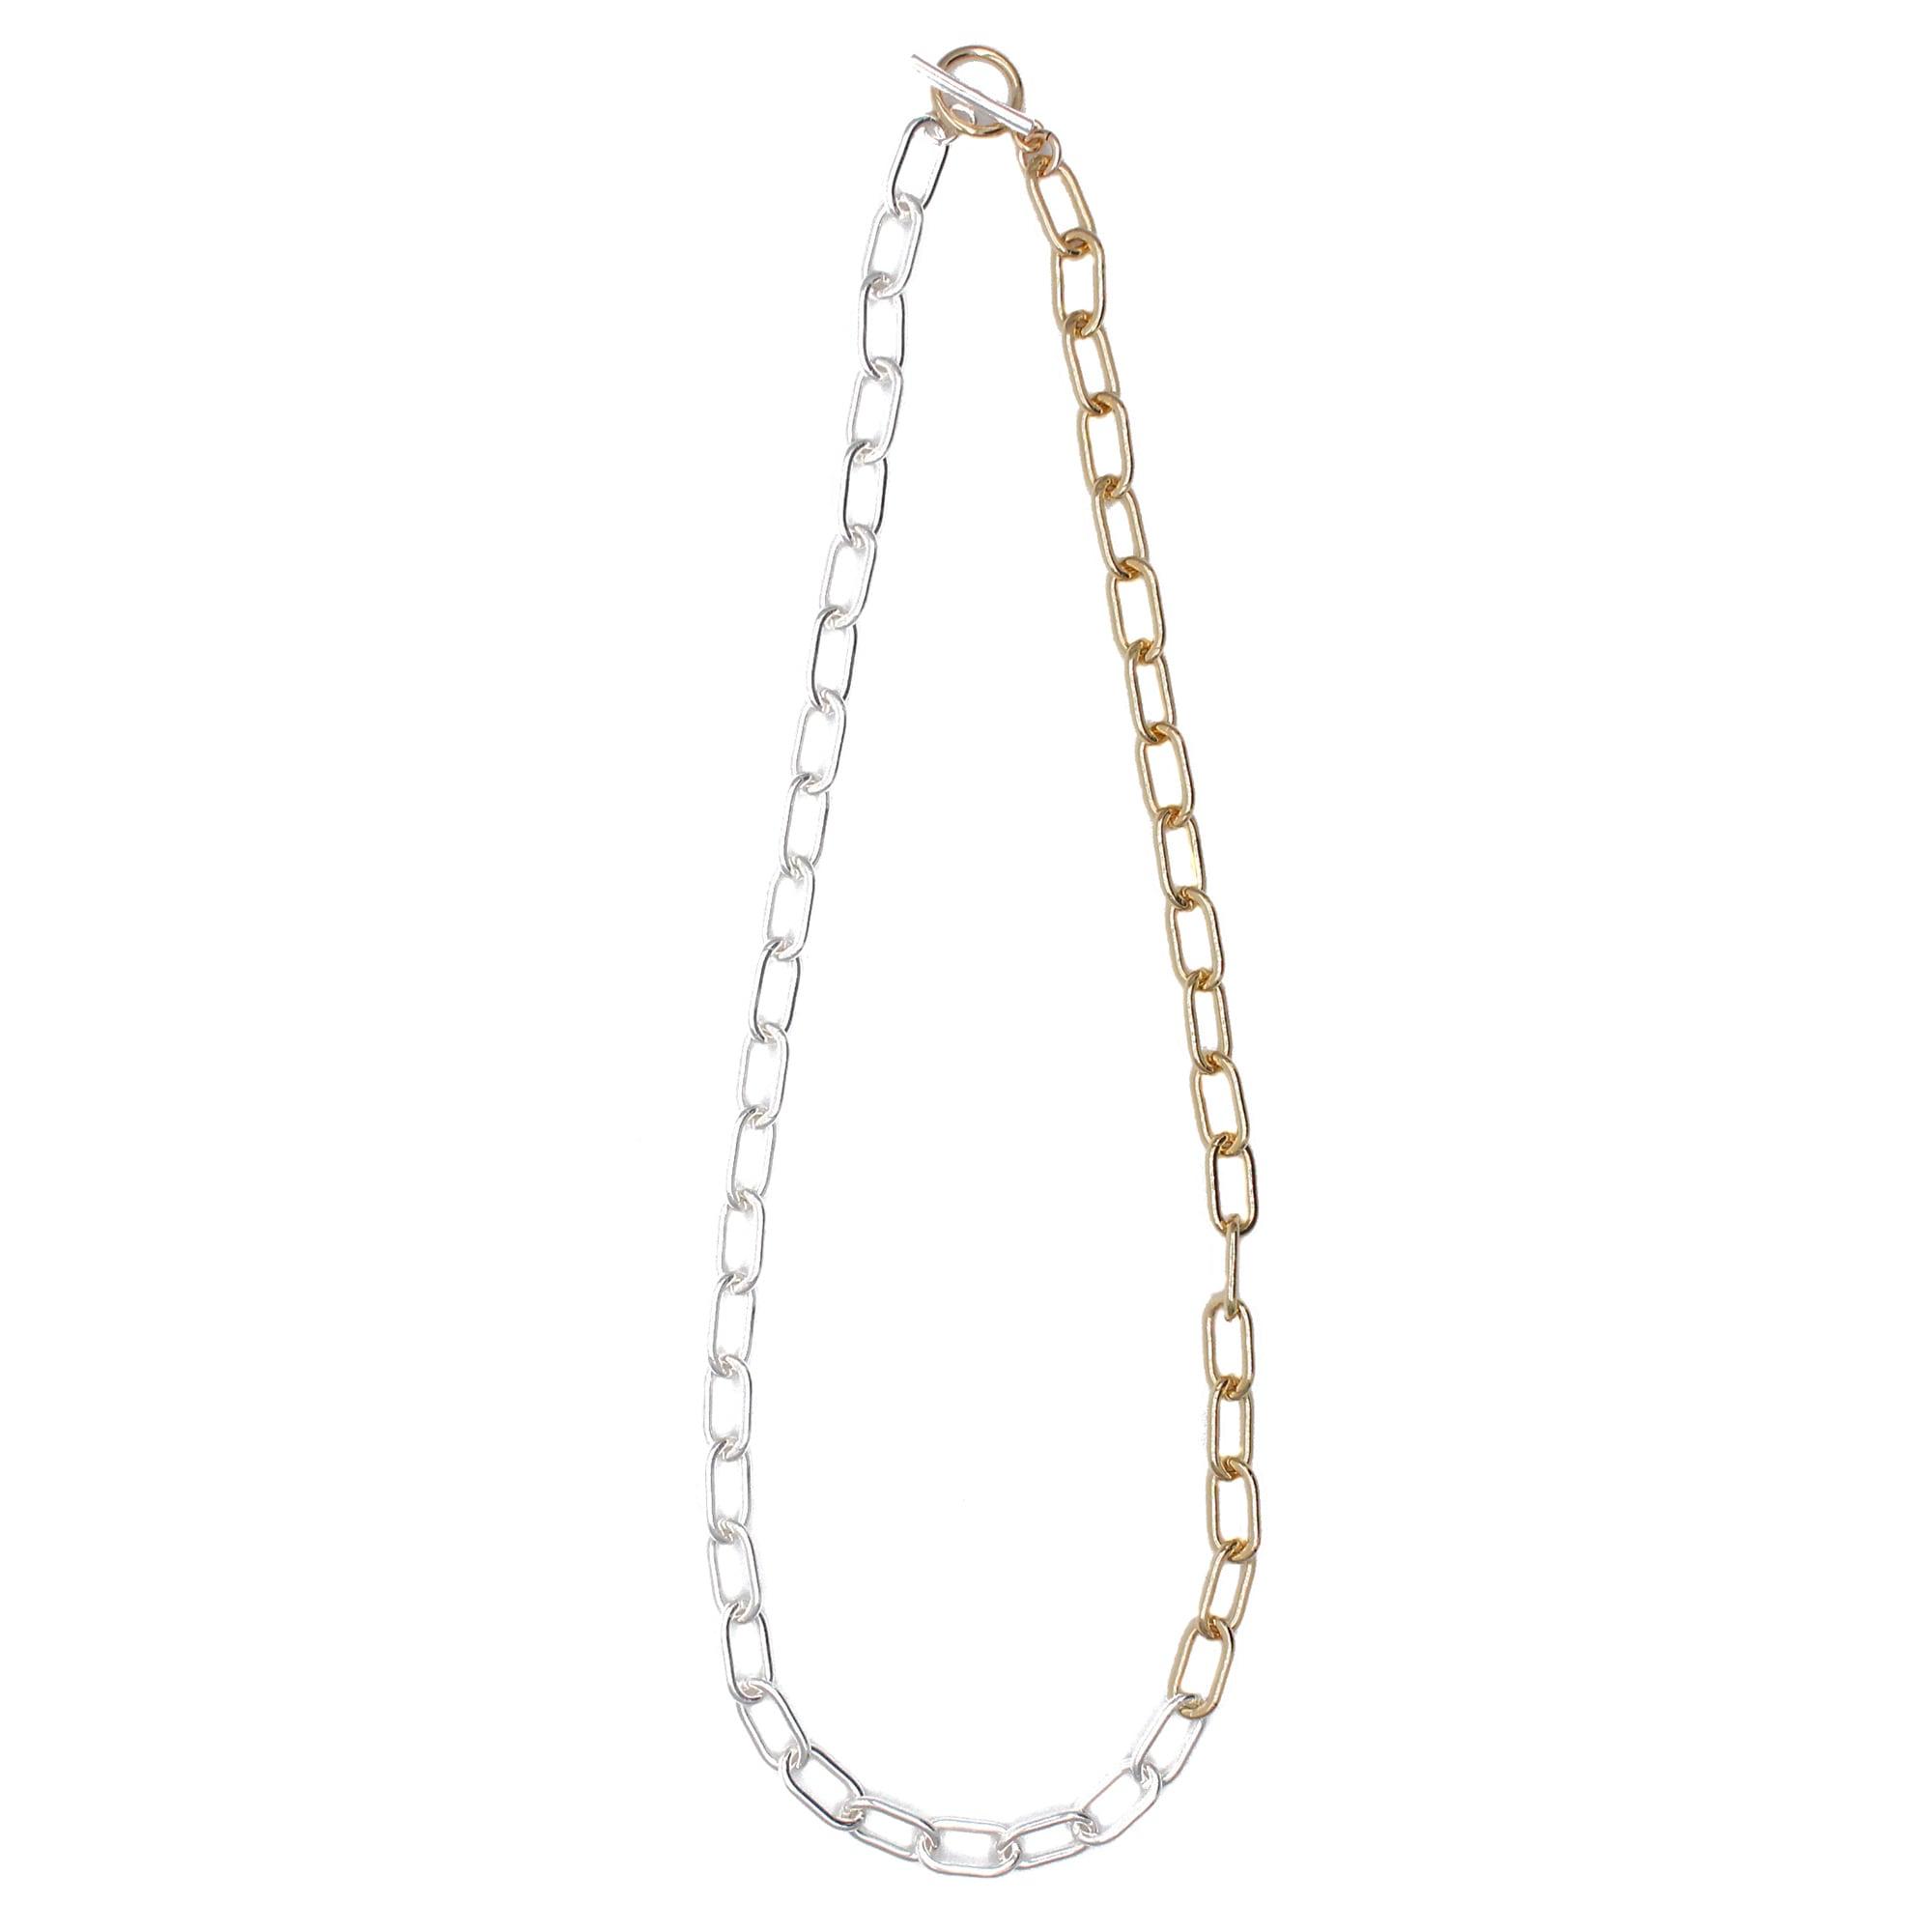 Ellipse Chain Necklace